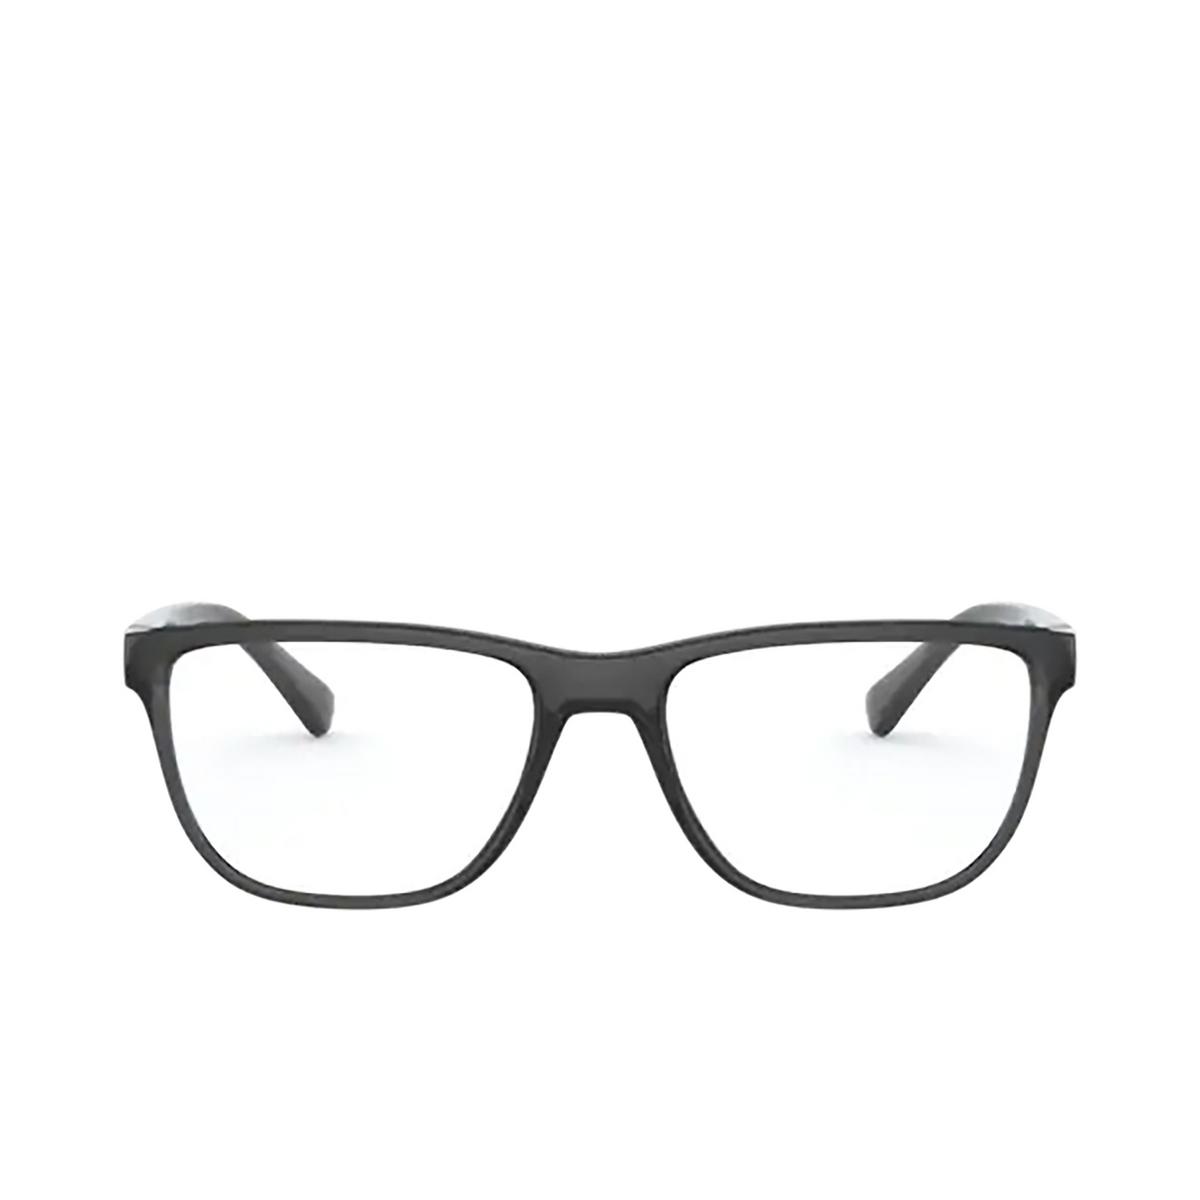 Dolce & Gabbana® Rectangle Eyeglasses: DG5053 color Transparent Grey / Black 3257 - front view.